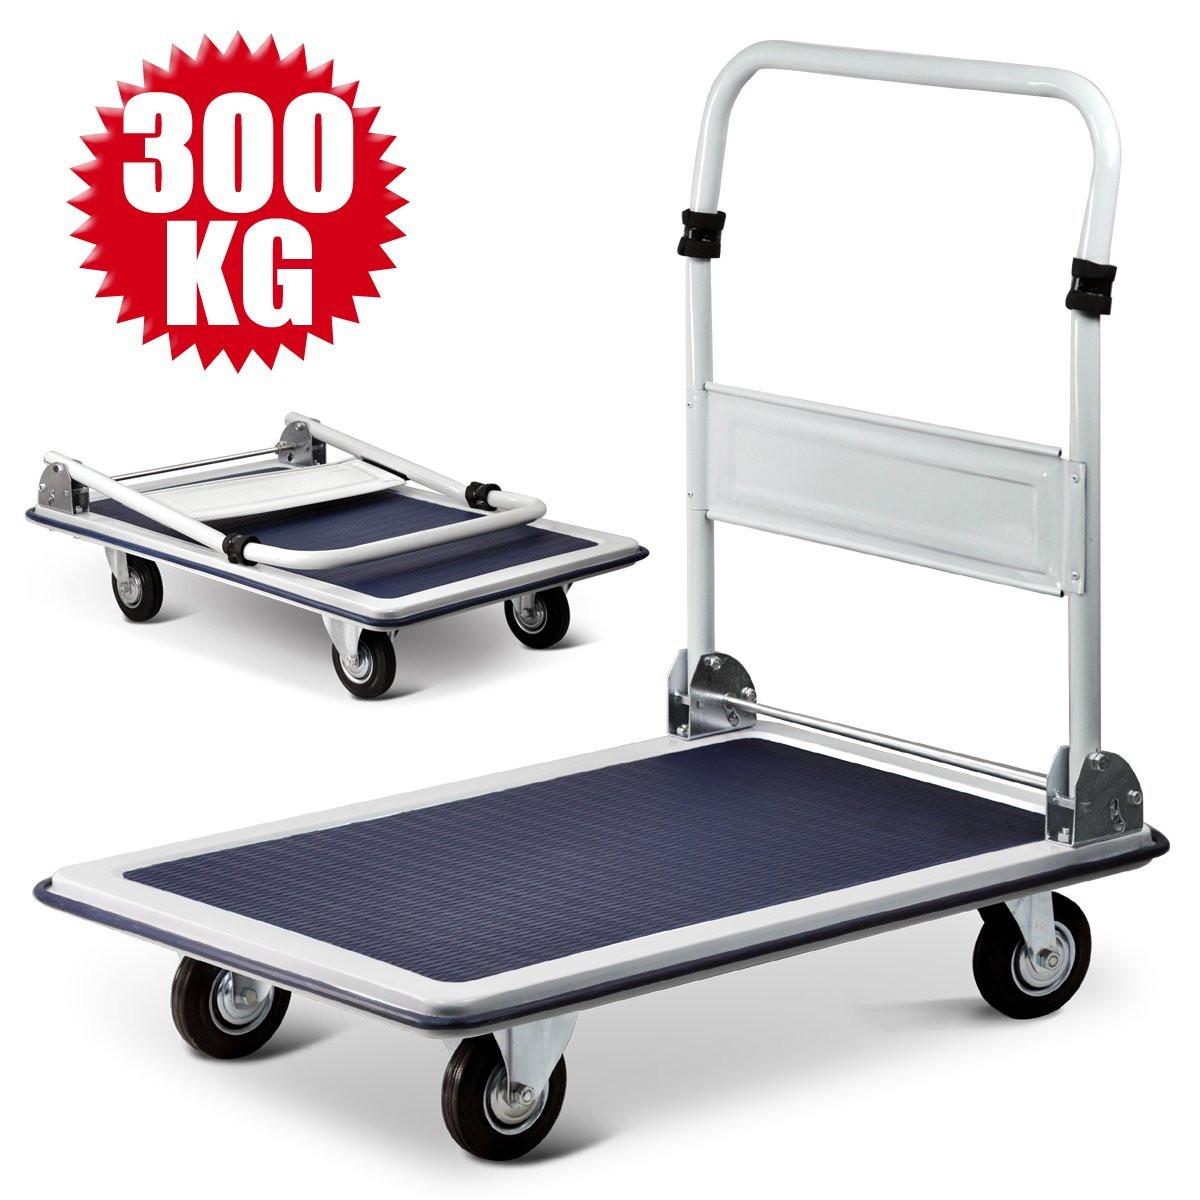 Тележка платформенная складная до 300 кг (920 х 620 мм)